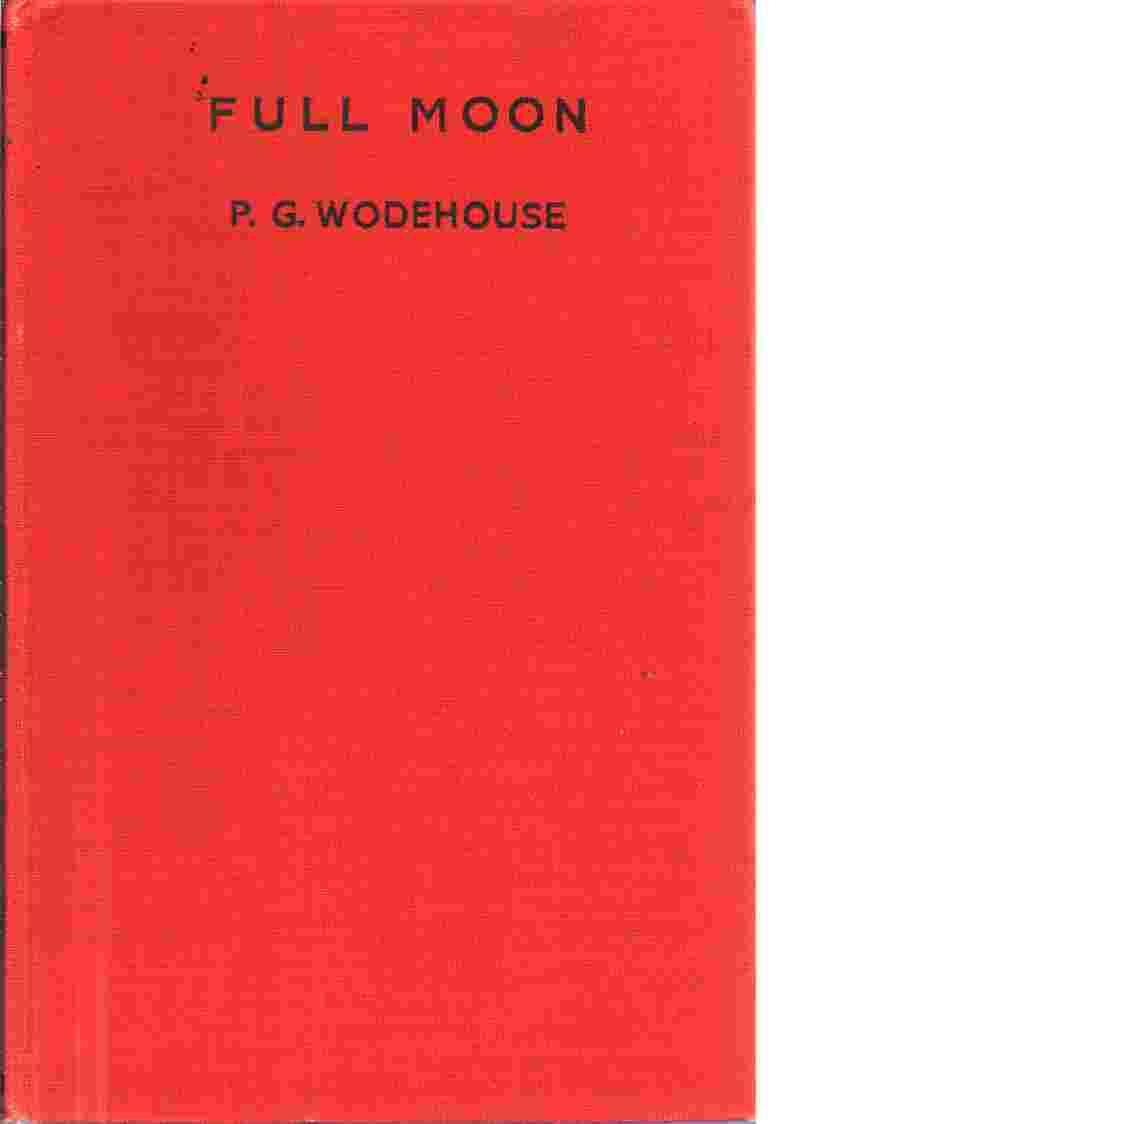 Full moon - Wodehouse, P. G.